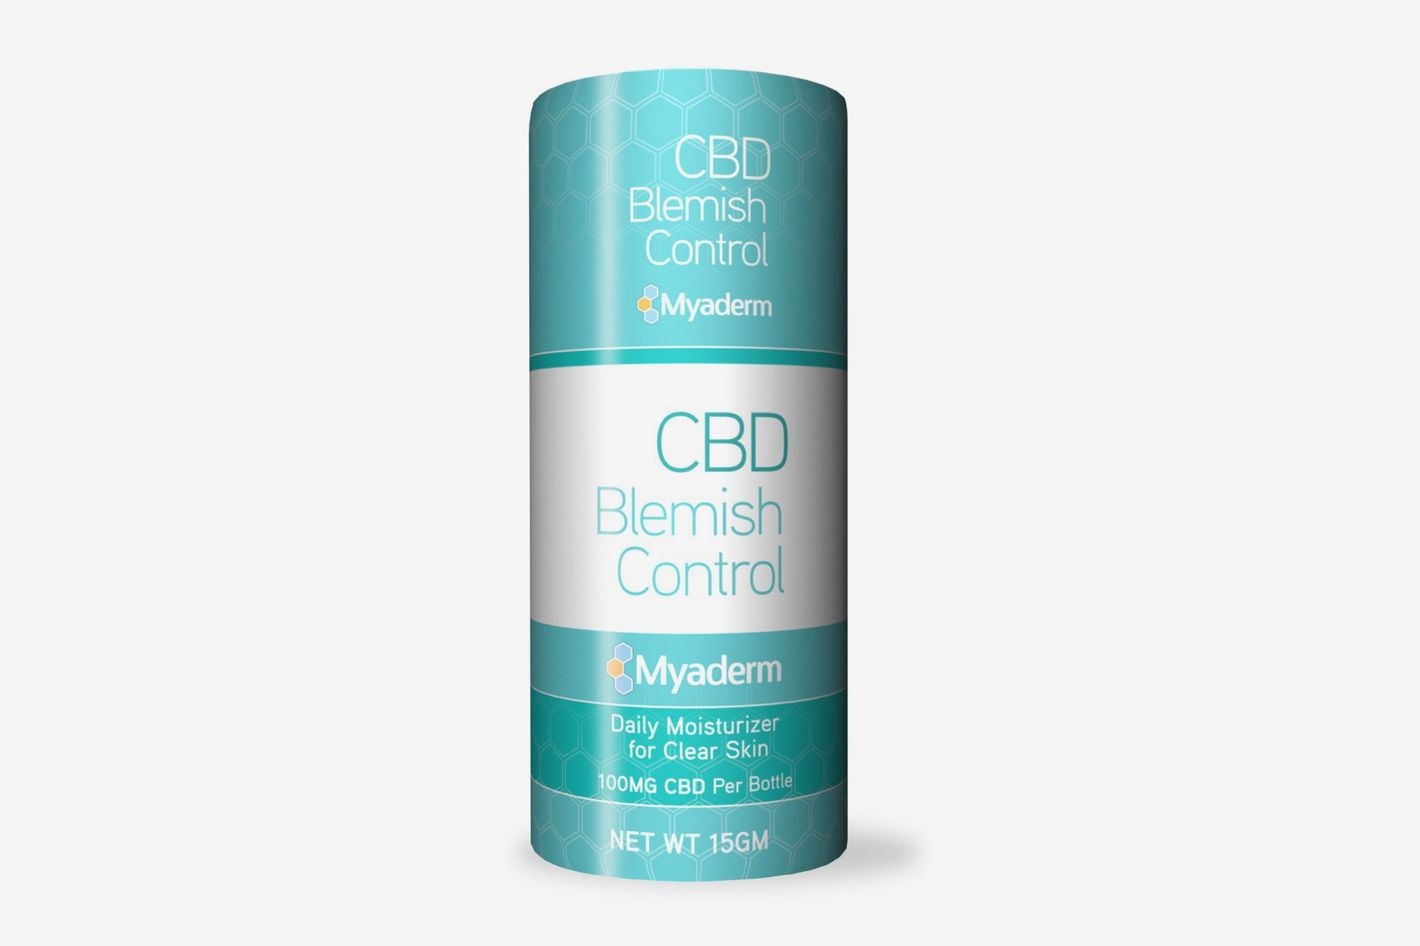 Myaderm CBD Blemish Control